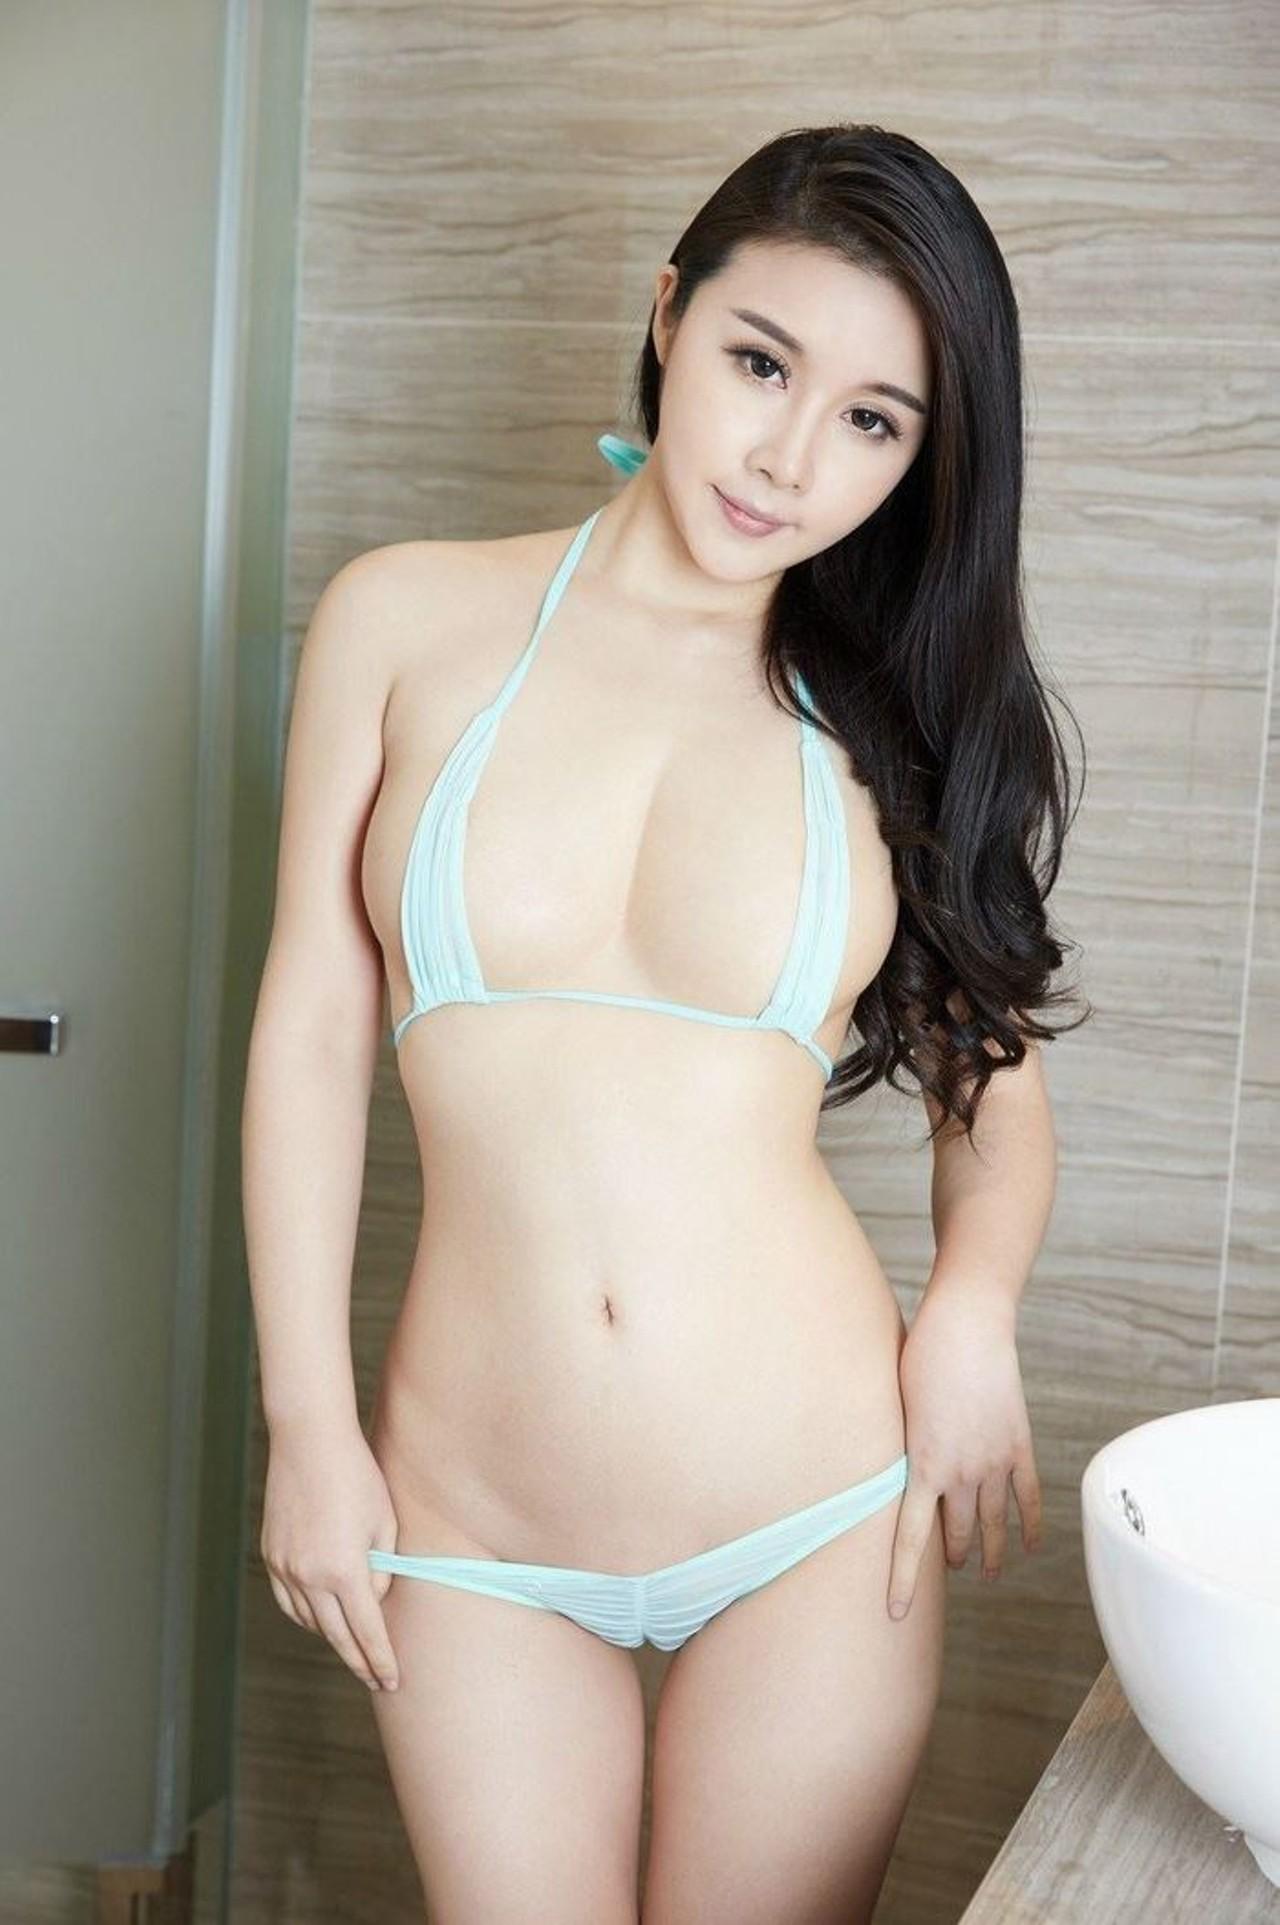 Female escort service